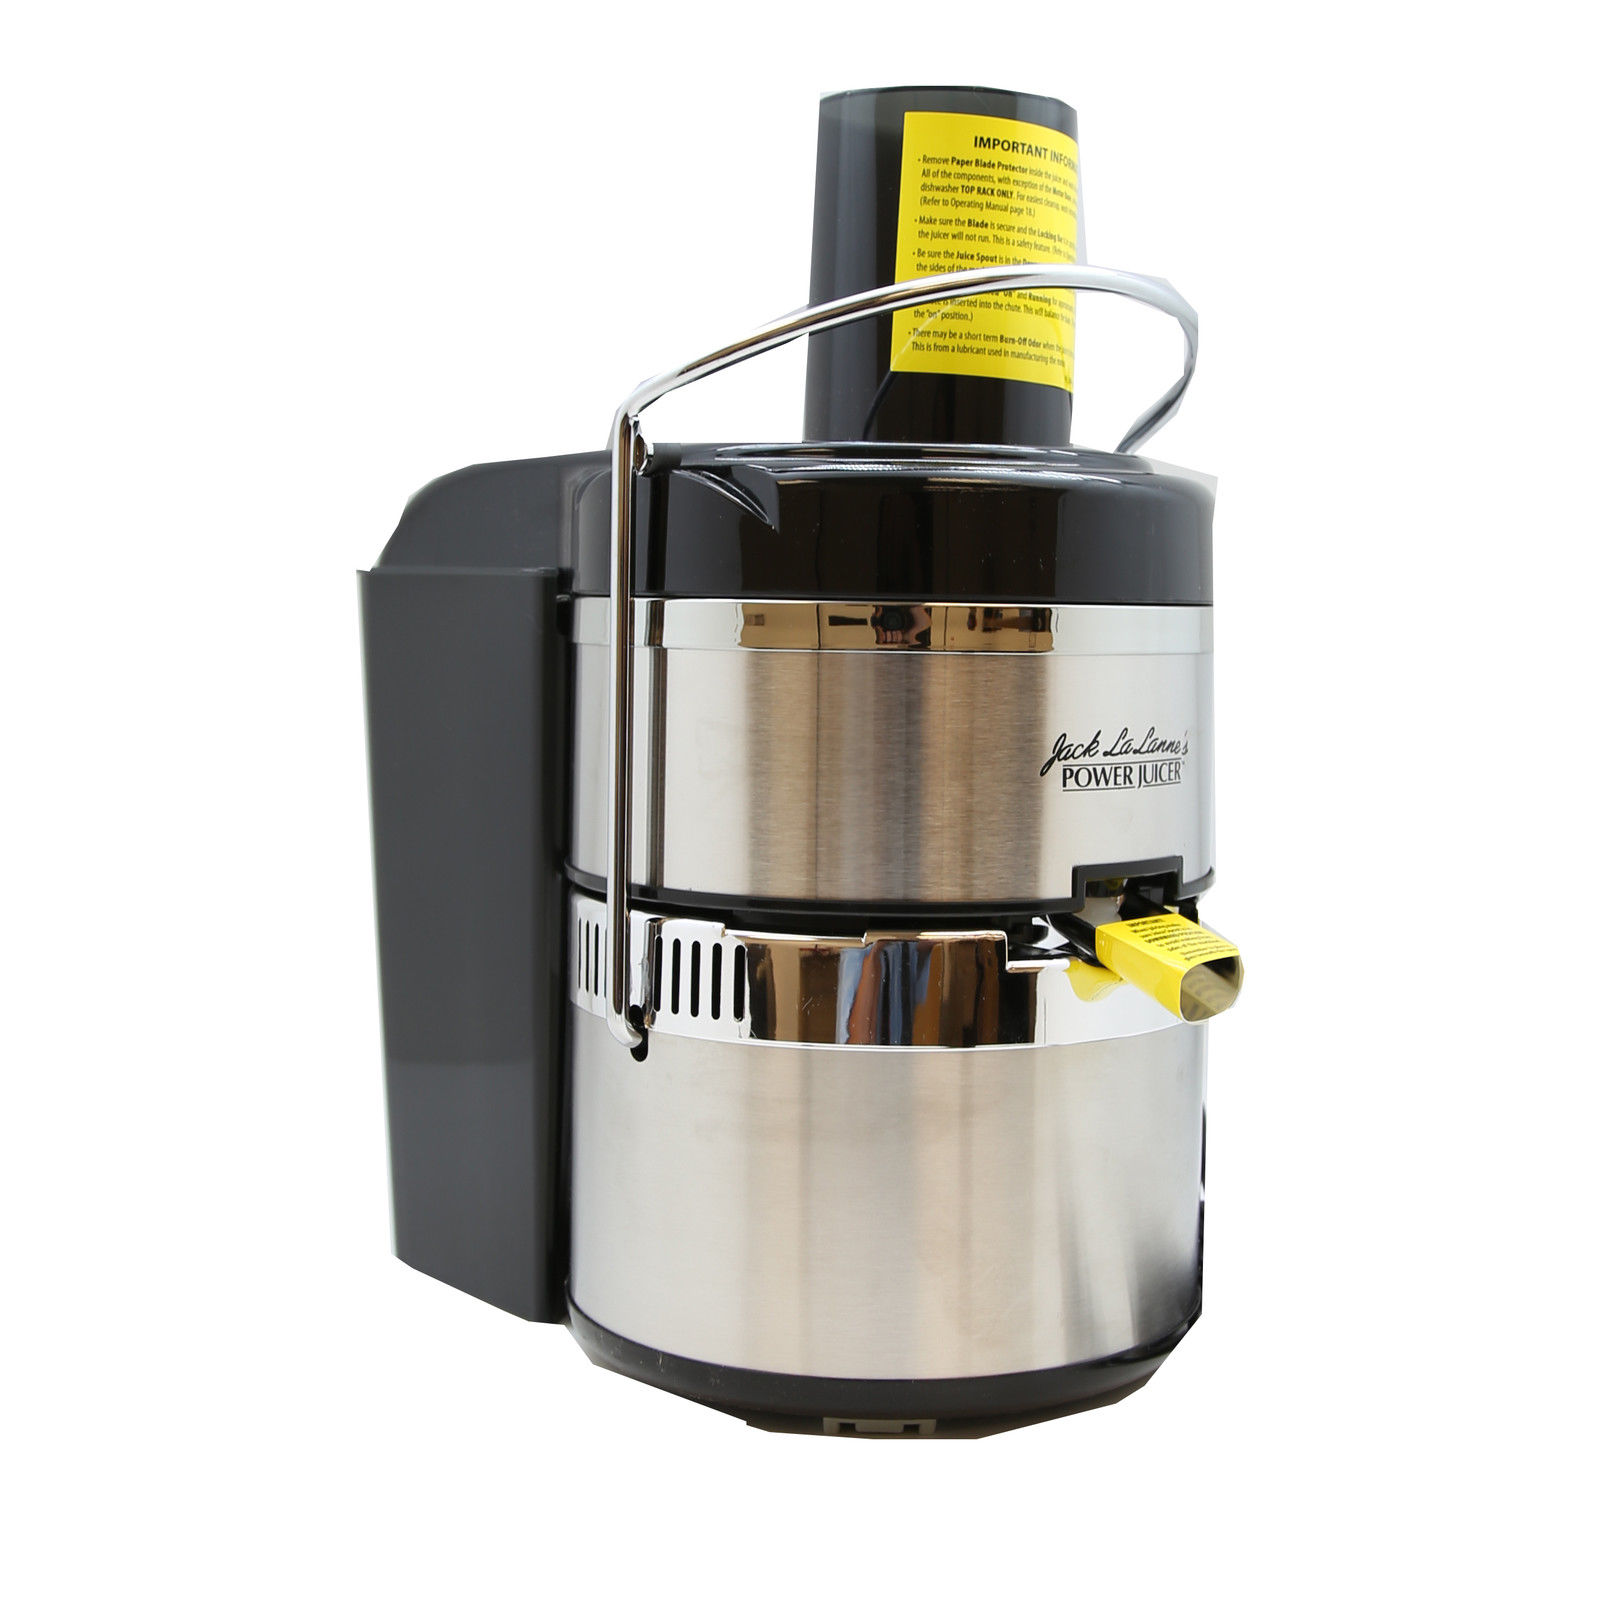 Pdf-0526] jack lalanne power juicer pro instruction manual | 2019.